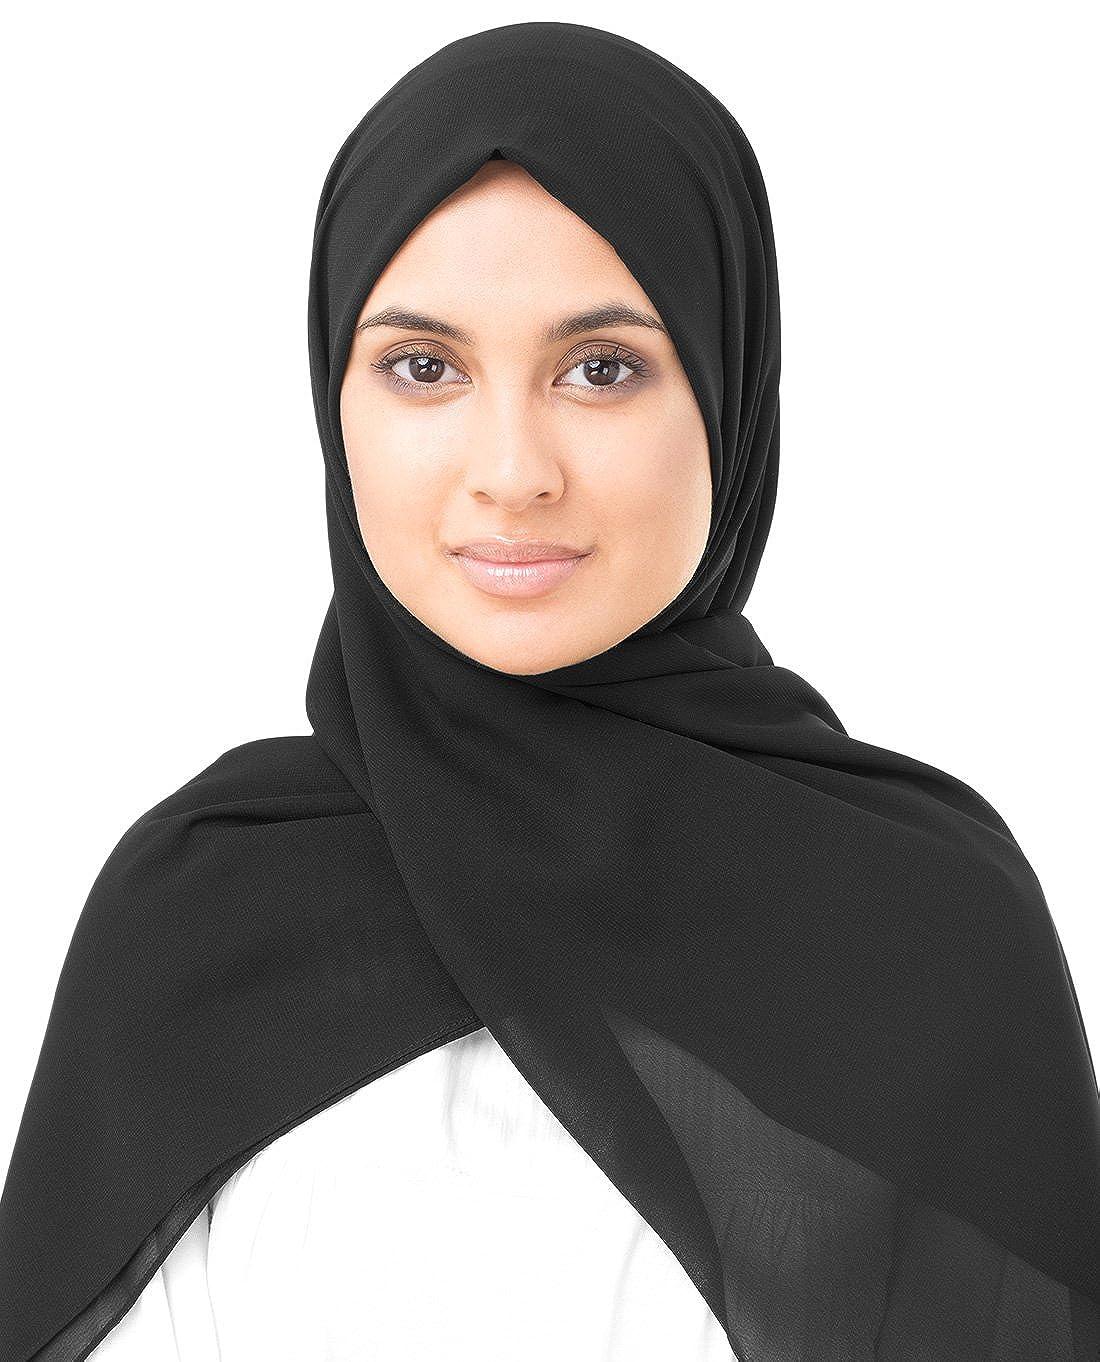 Inessence New Sheer Georgette Ladies Summer Scarf Hijab Segitiga Buble Georgete Wrap Clothing